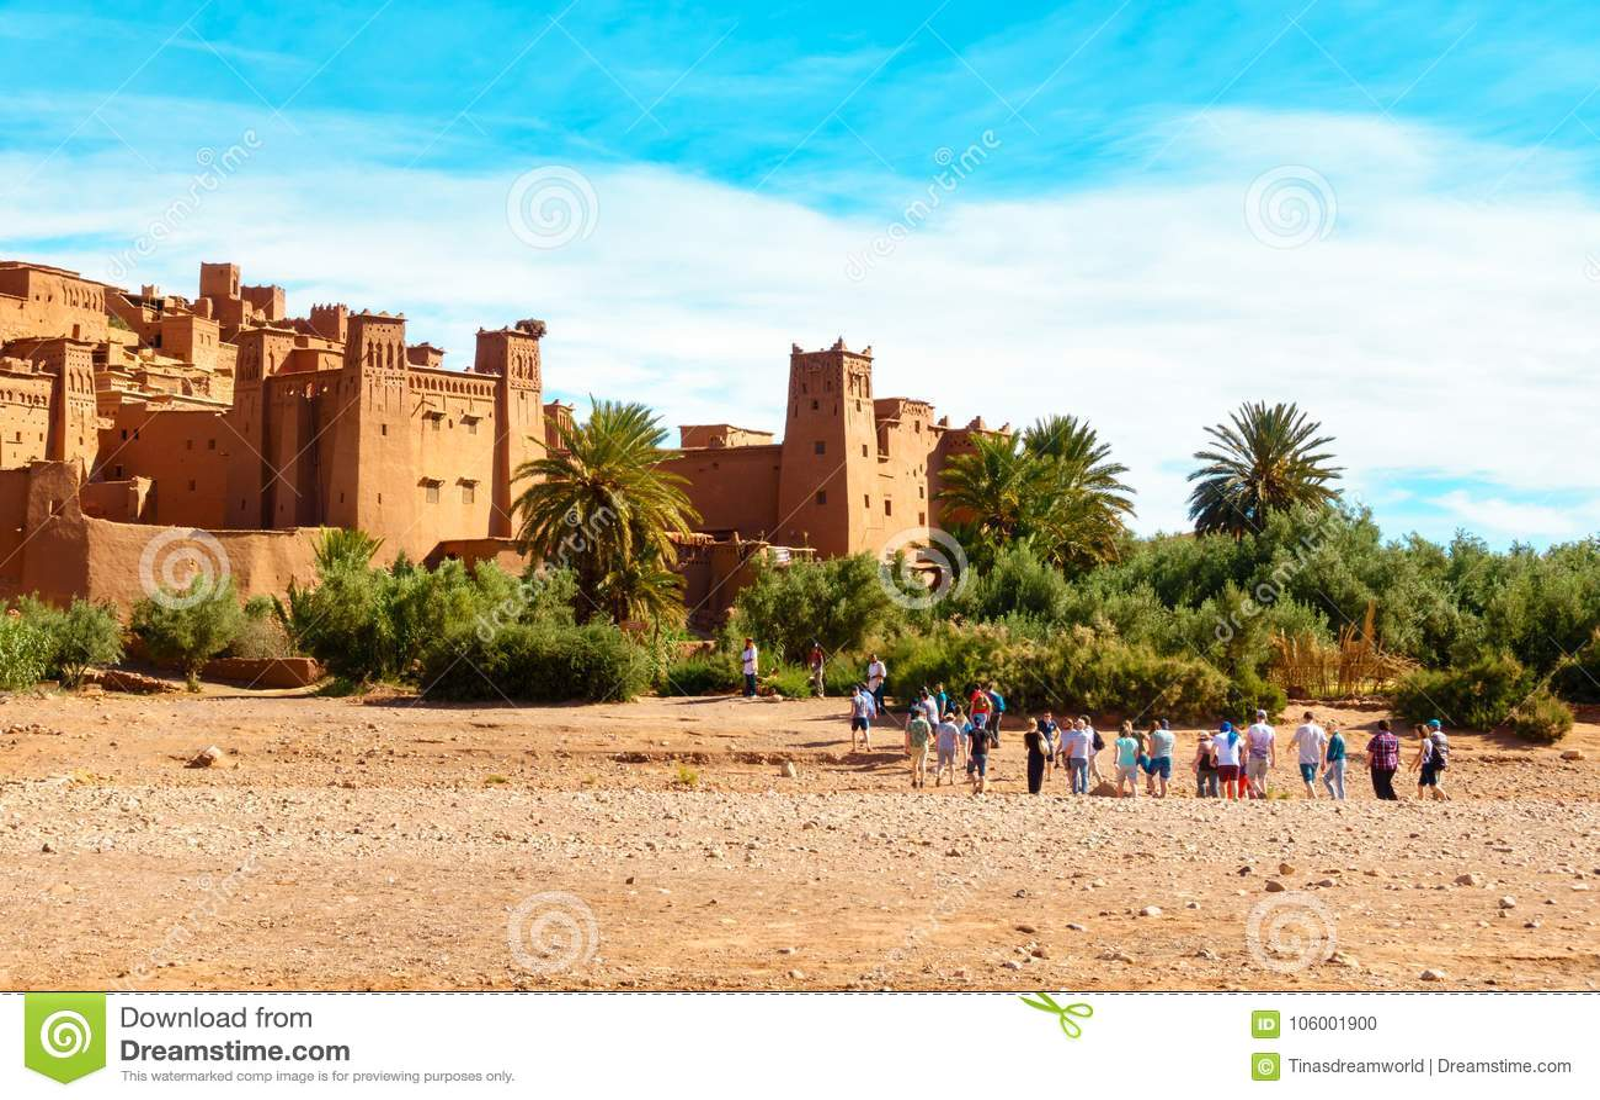 Touristes marchant vers Ait Benhaddou, Maroc